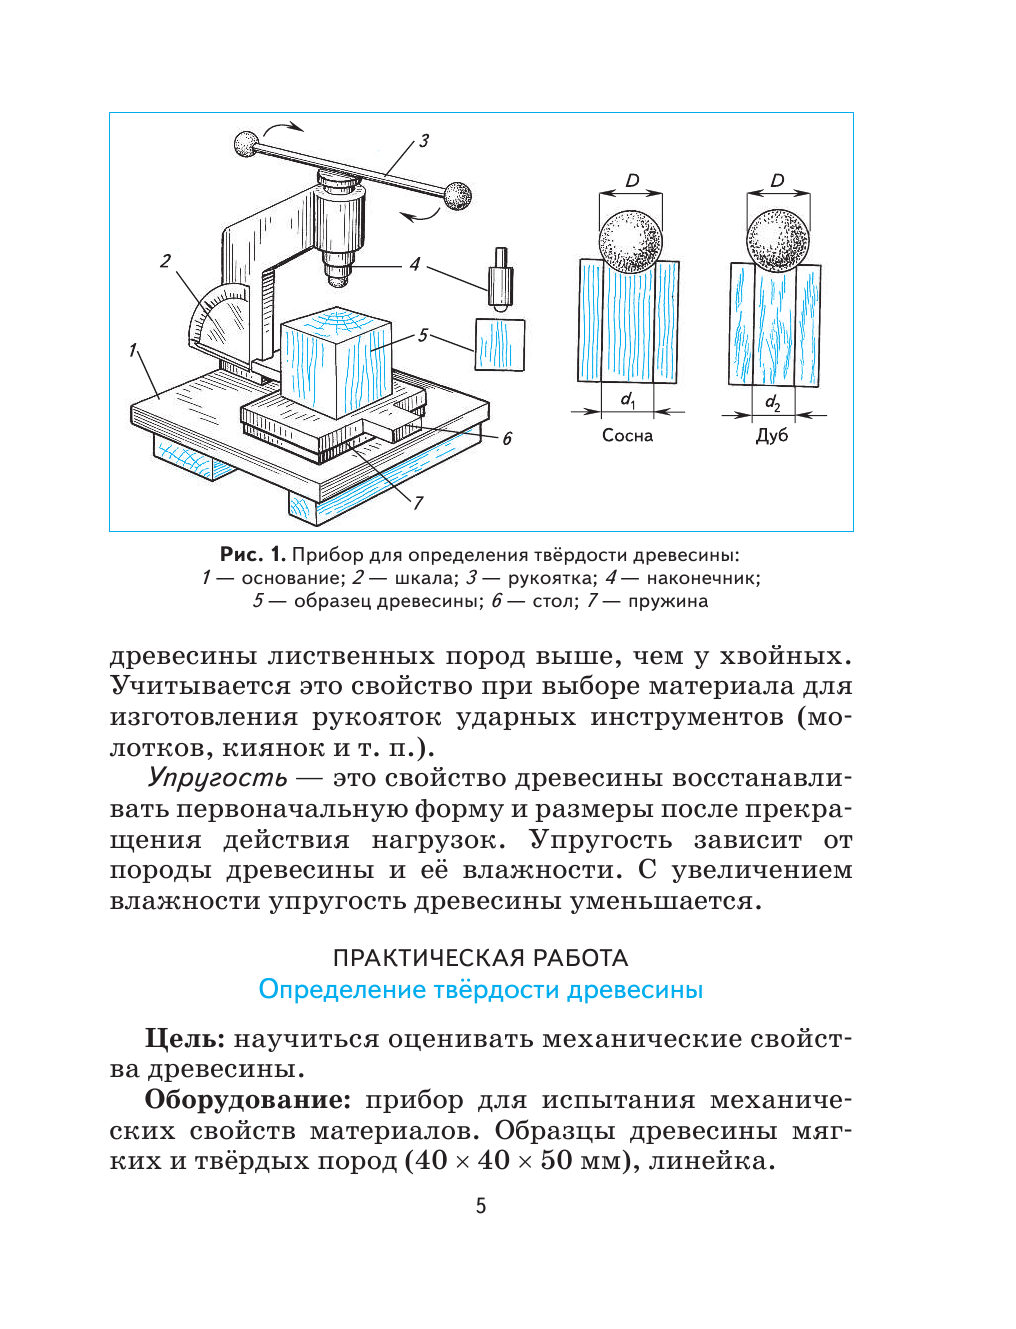 Технология. Технический труд. 6 класс. Учебник. - страница 5